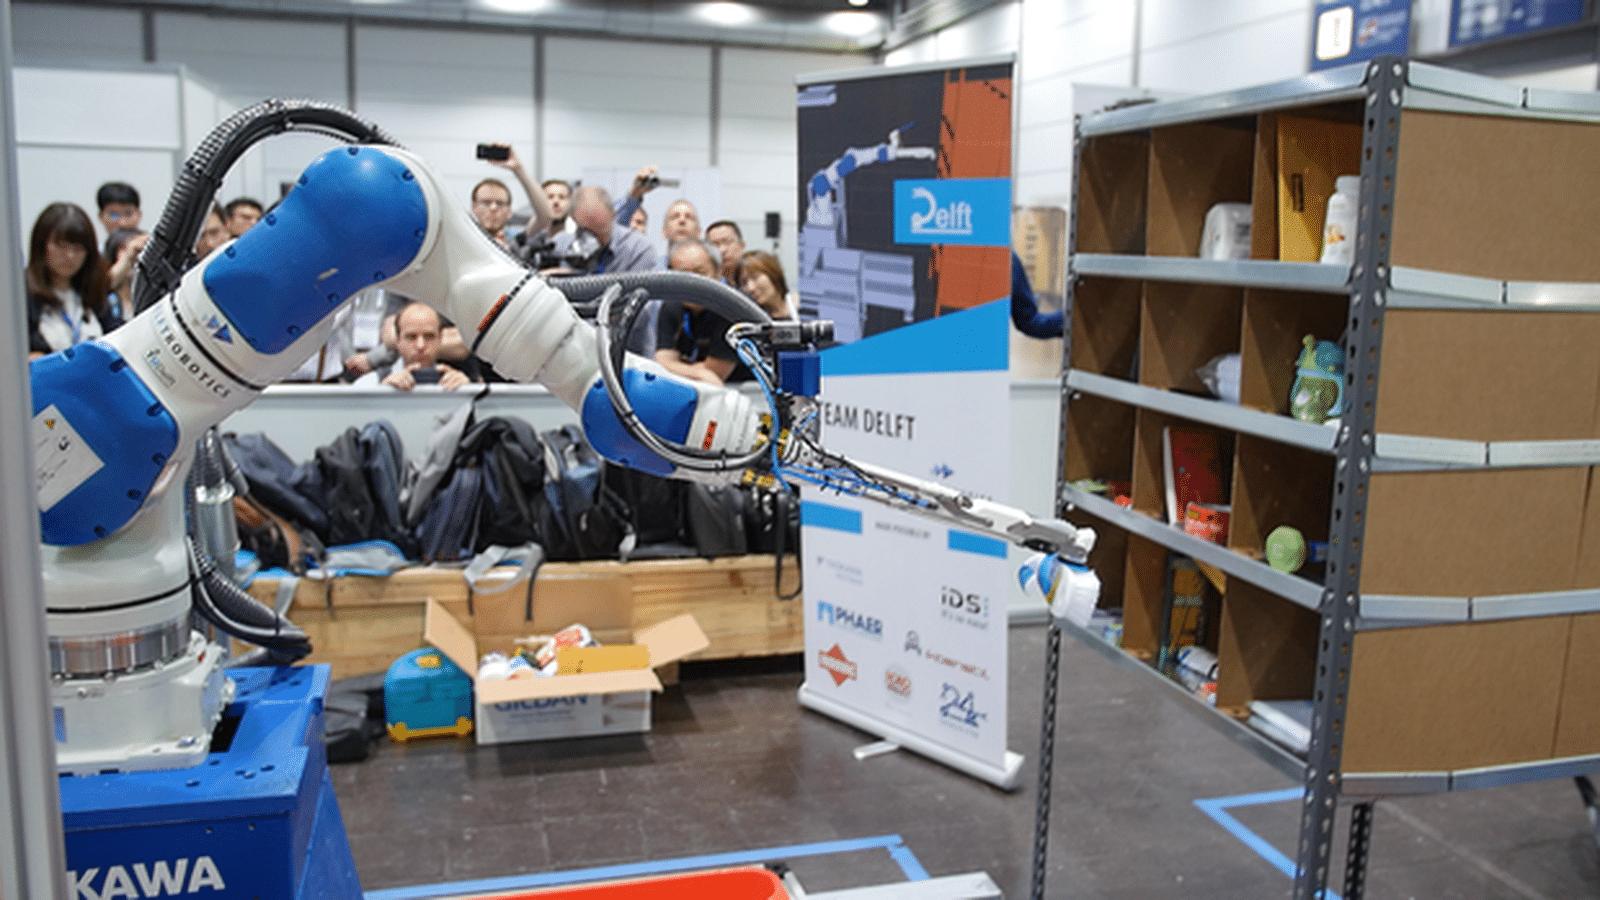 Gpus Power Winning Autonomous Robots In Amazon Picking